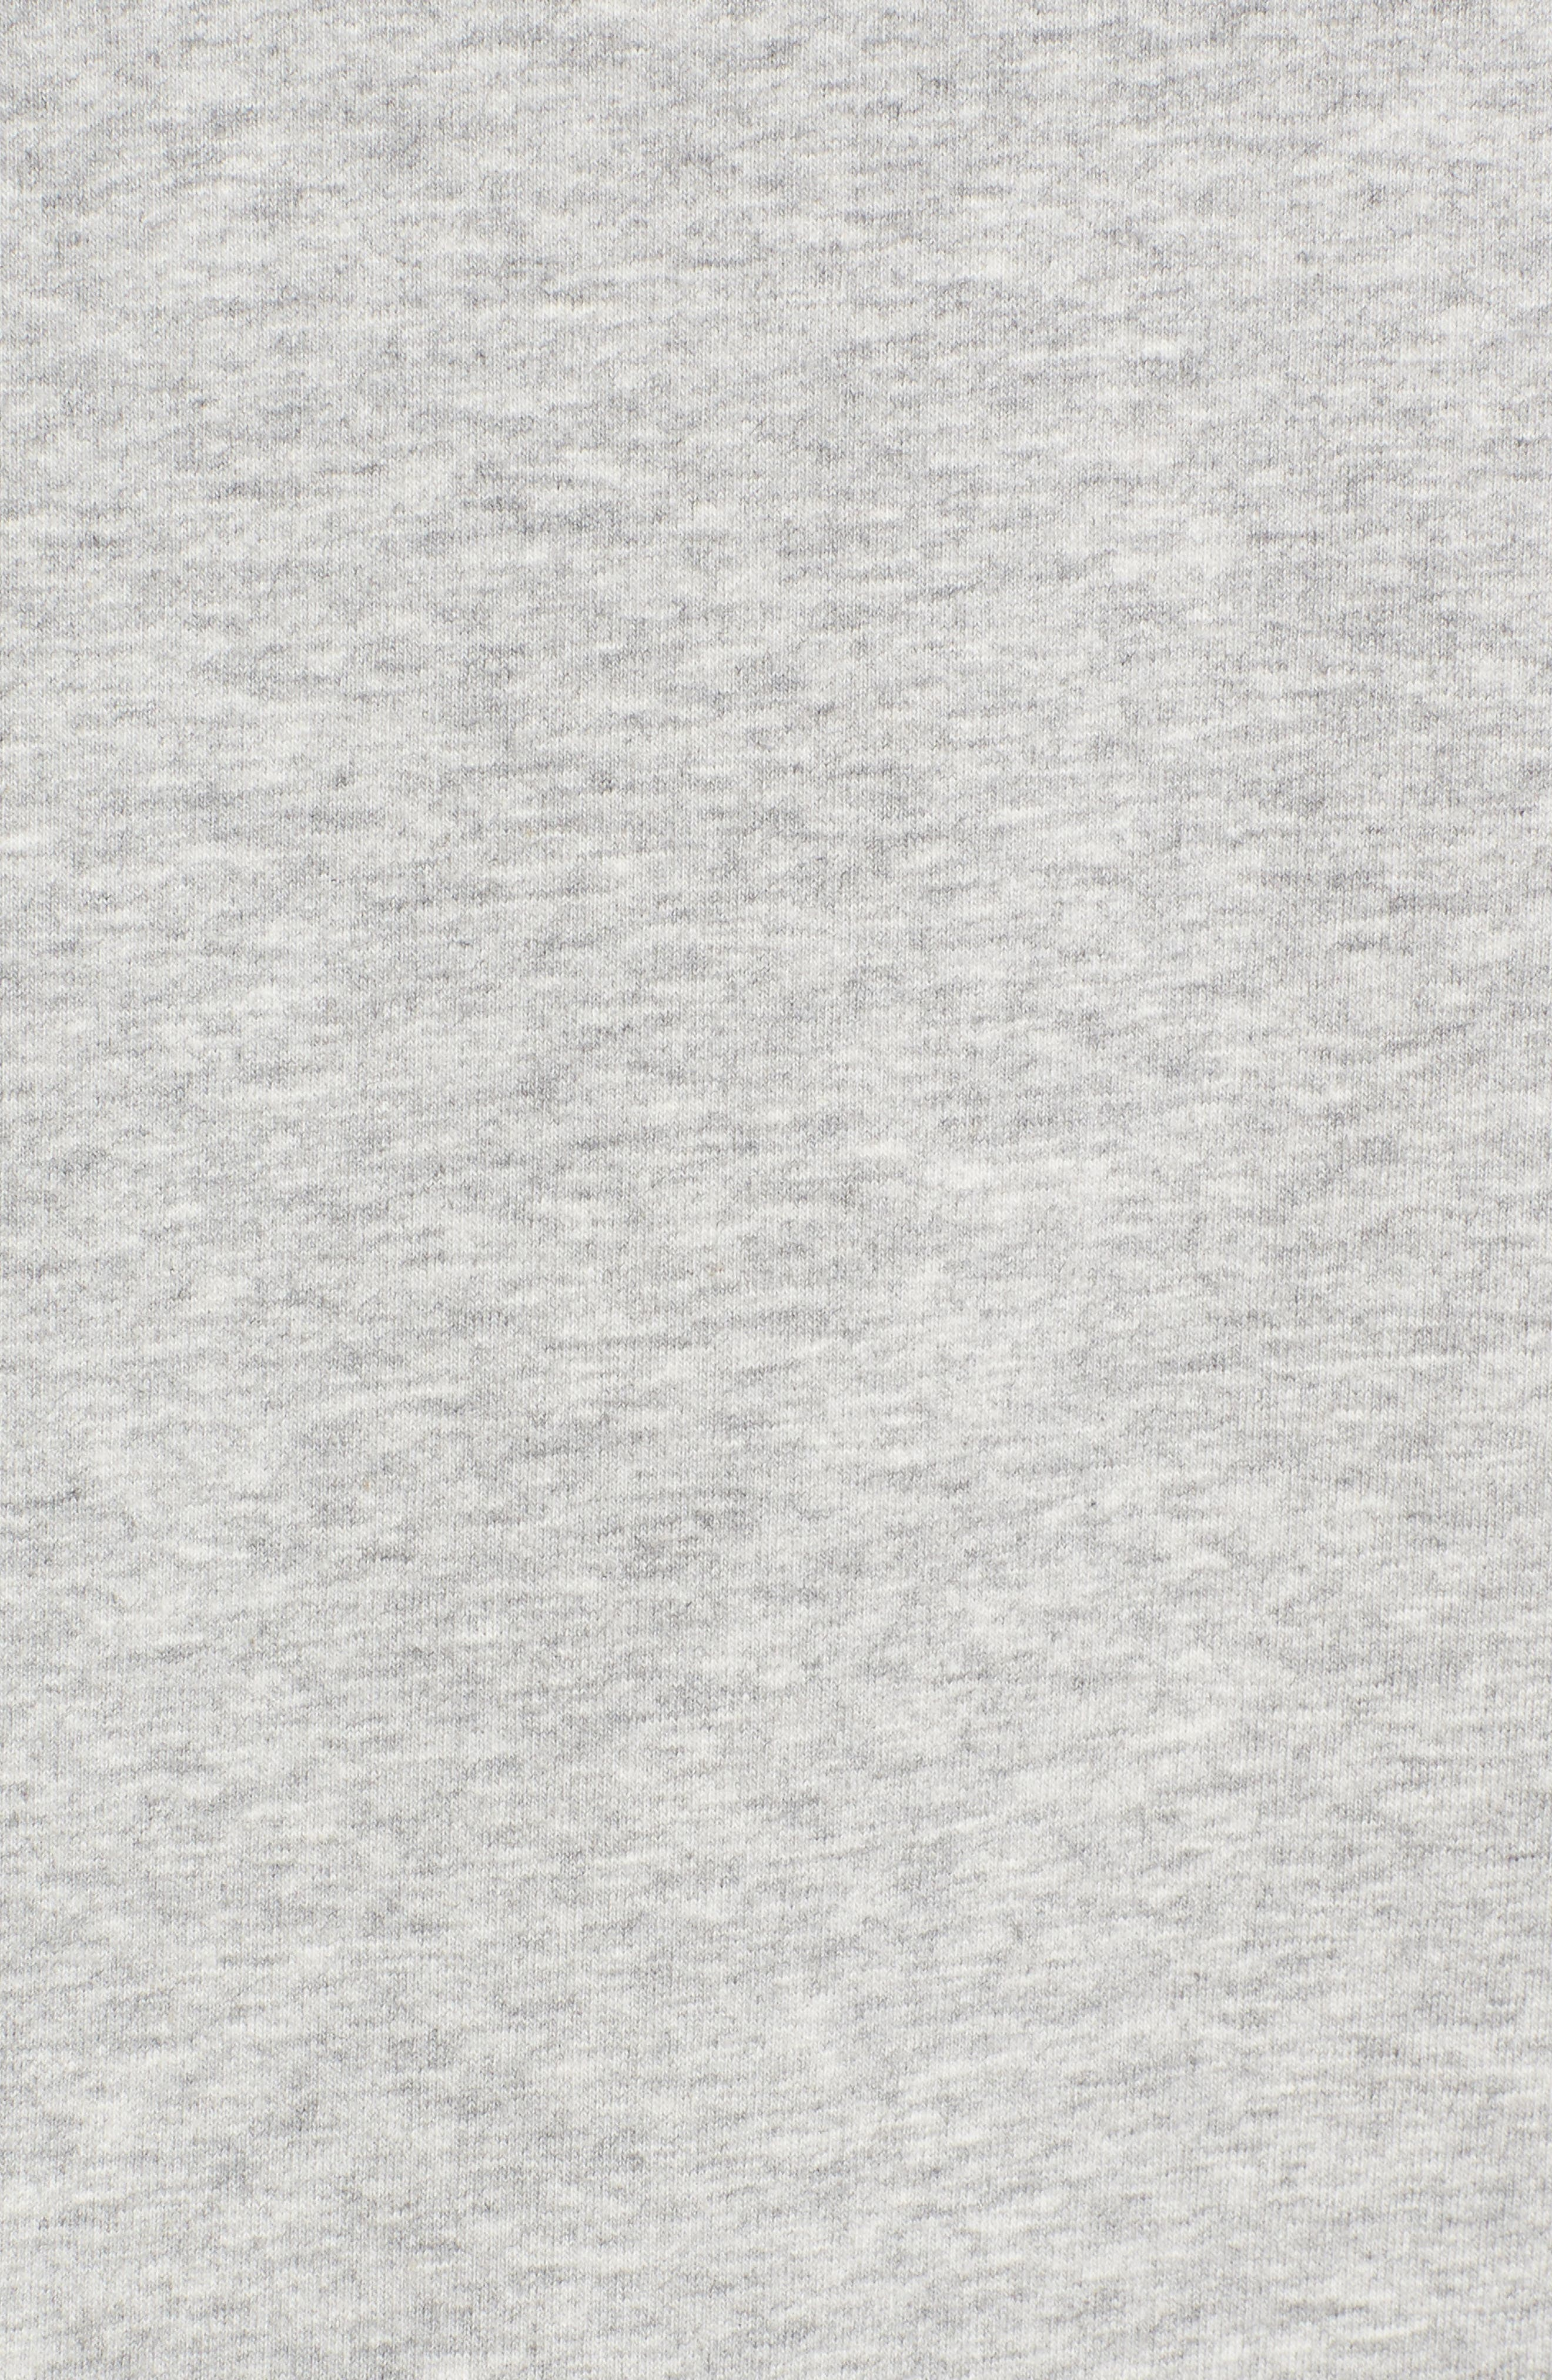 Tie Back Sweatshirt,                             Alternate thumbnail 5, color,                             Grey Heather